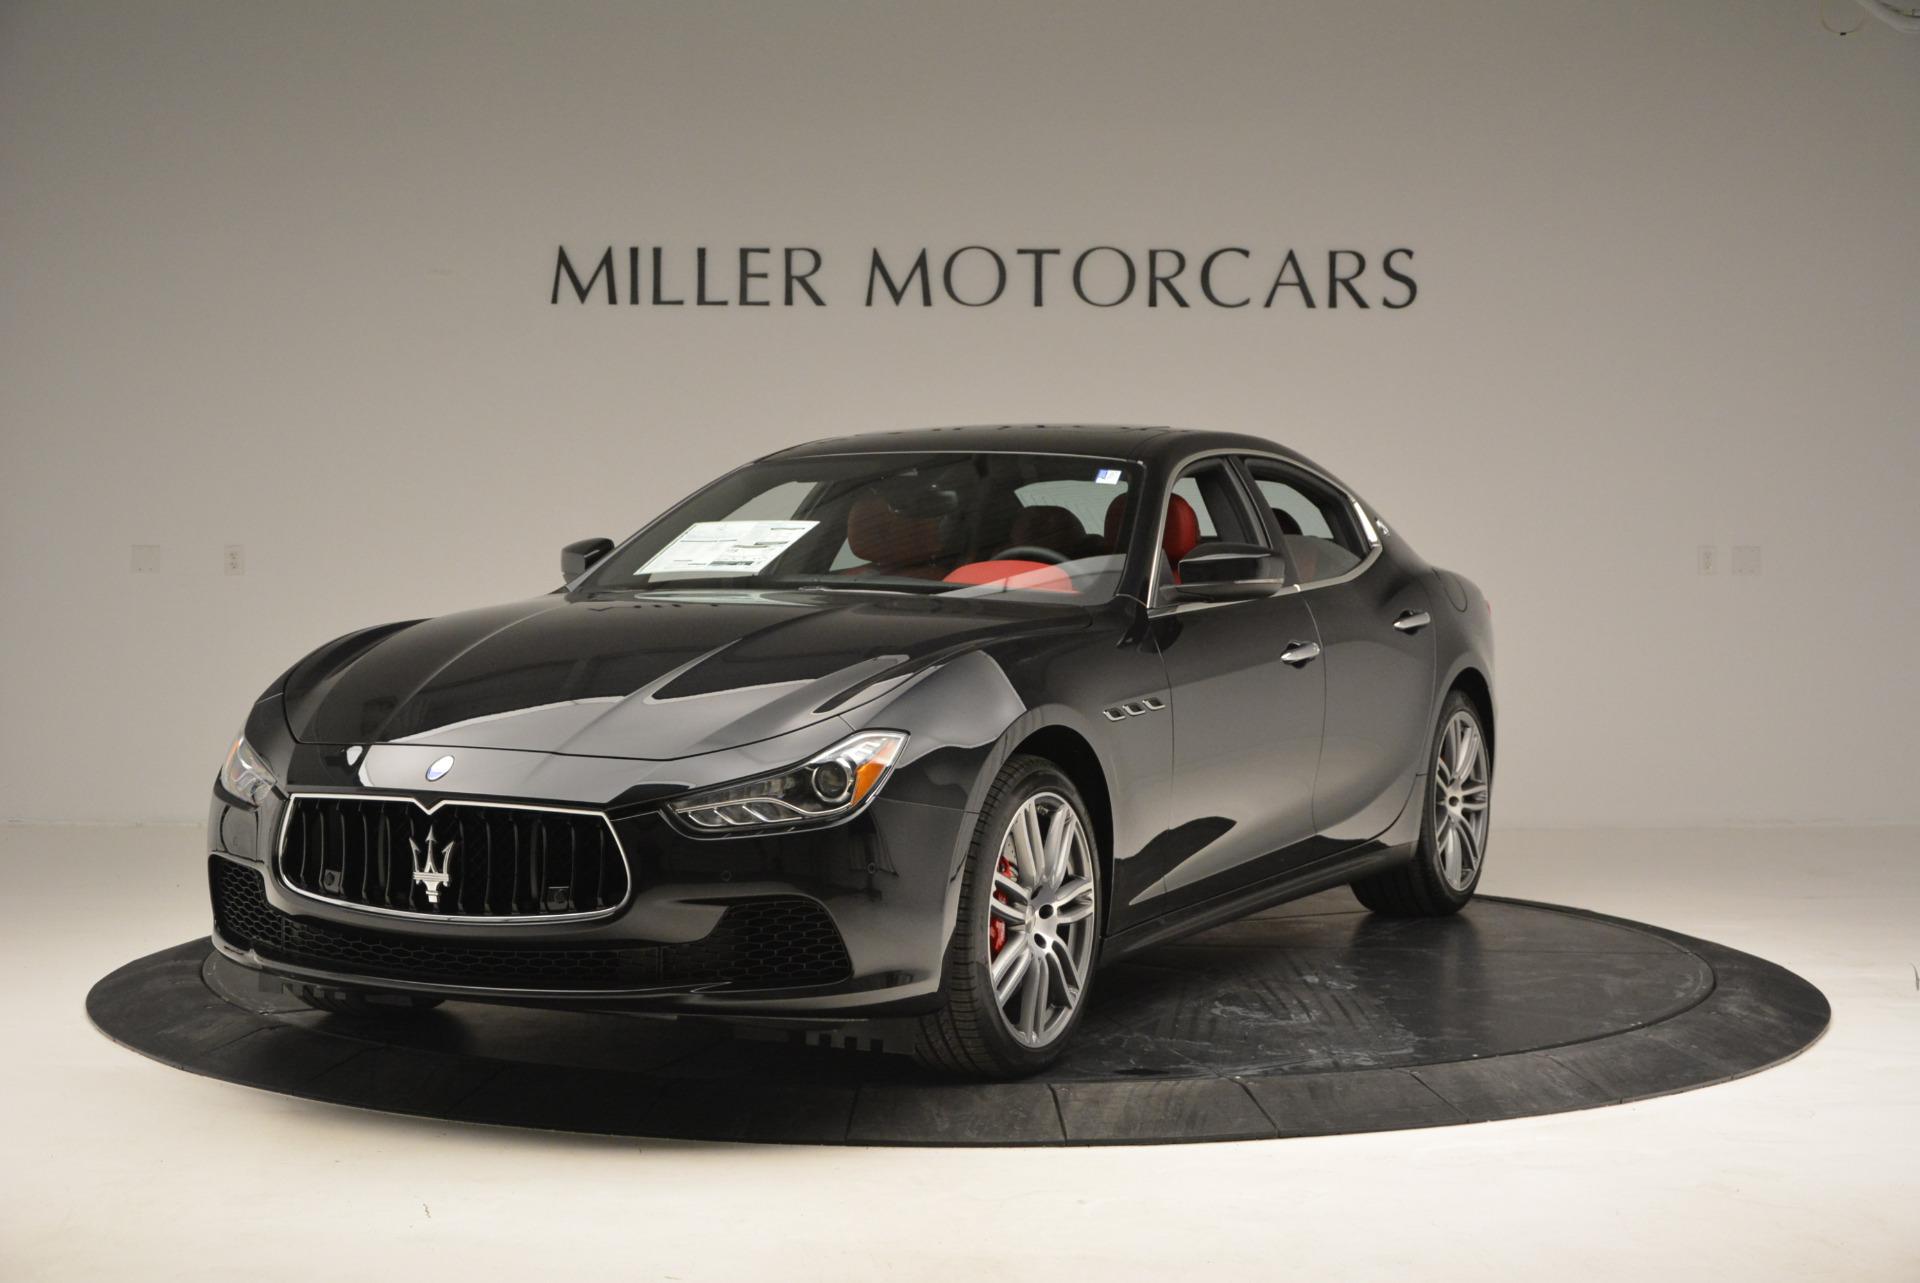 New 2017 Maserati Ghibli S Q4 For Sale In Greenwich, CT 789_main